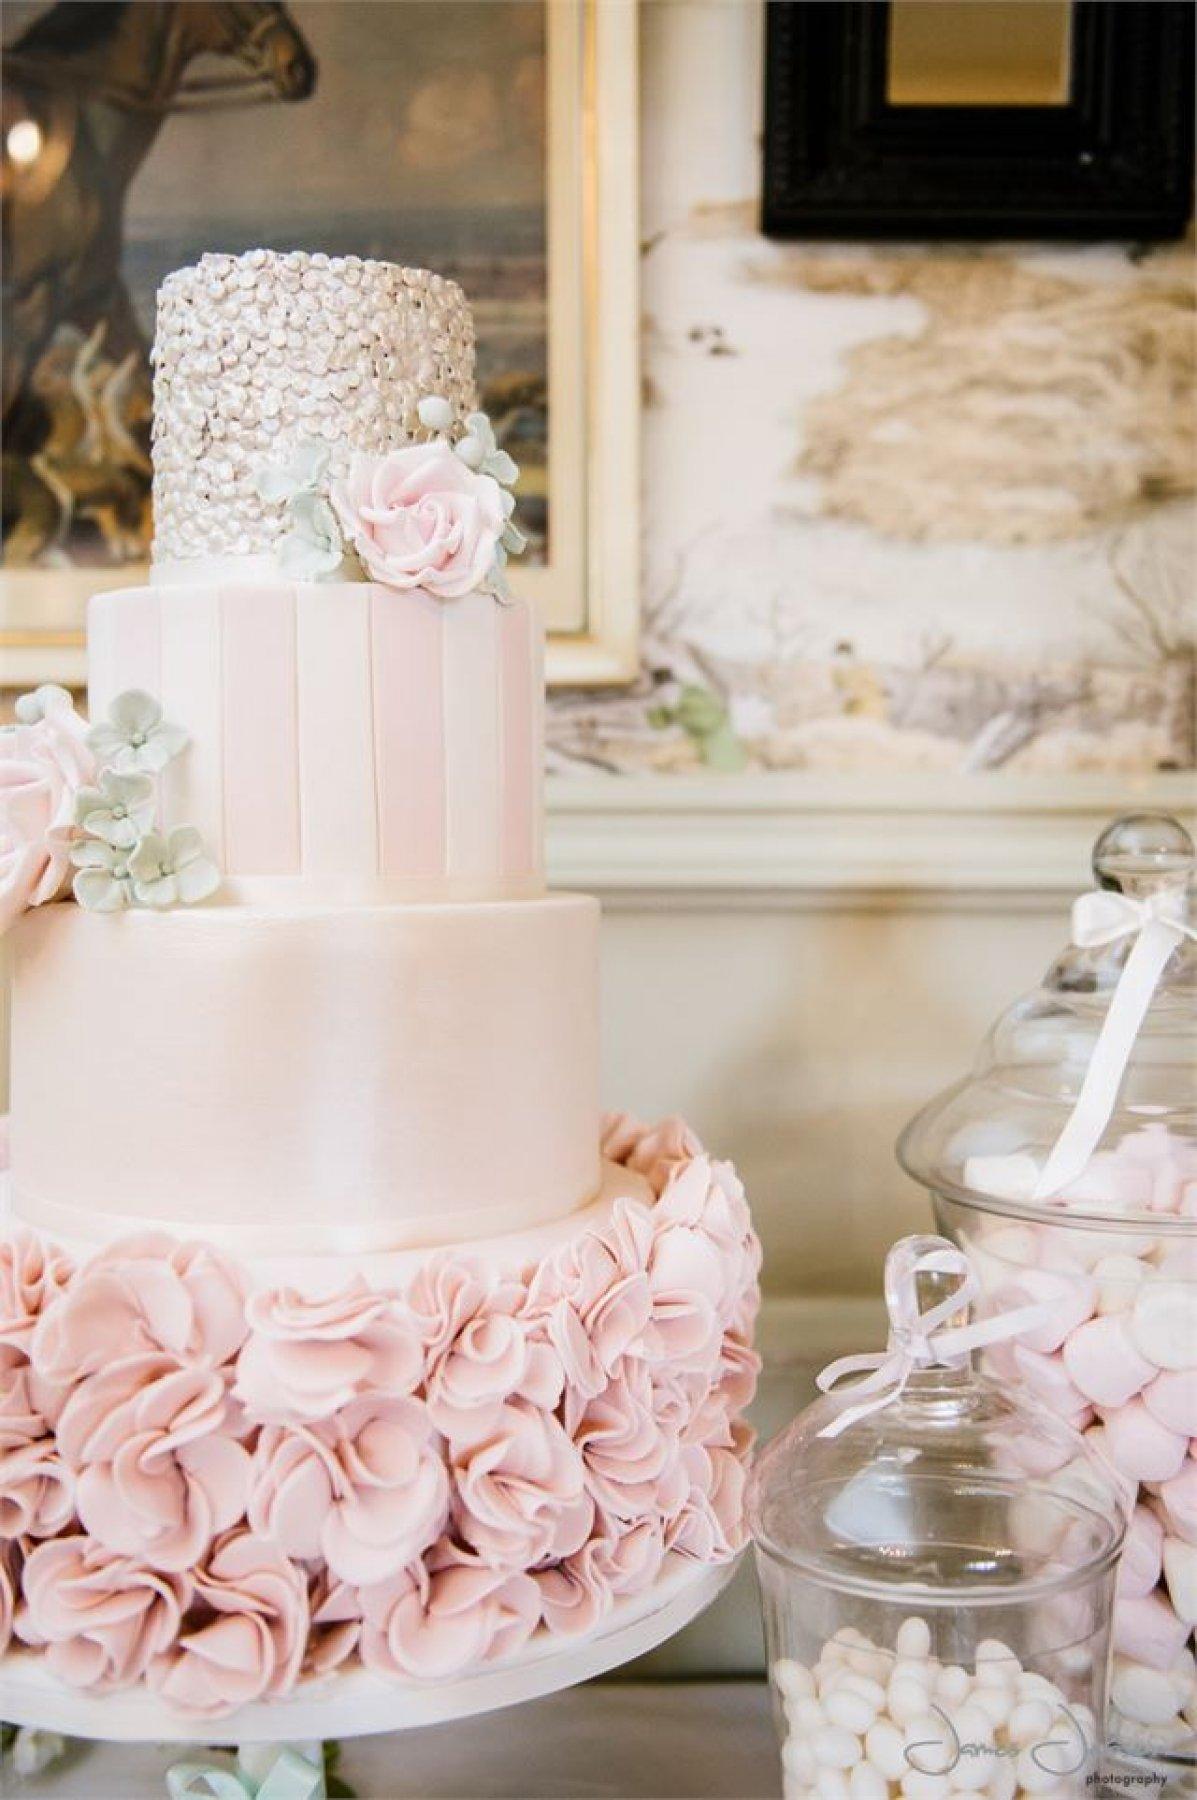 Wedding Cakes Near Me - WeddingPlanner.co.uk